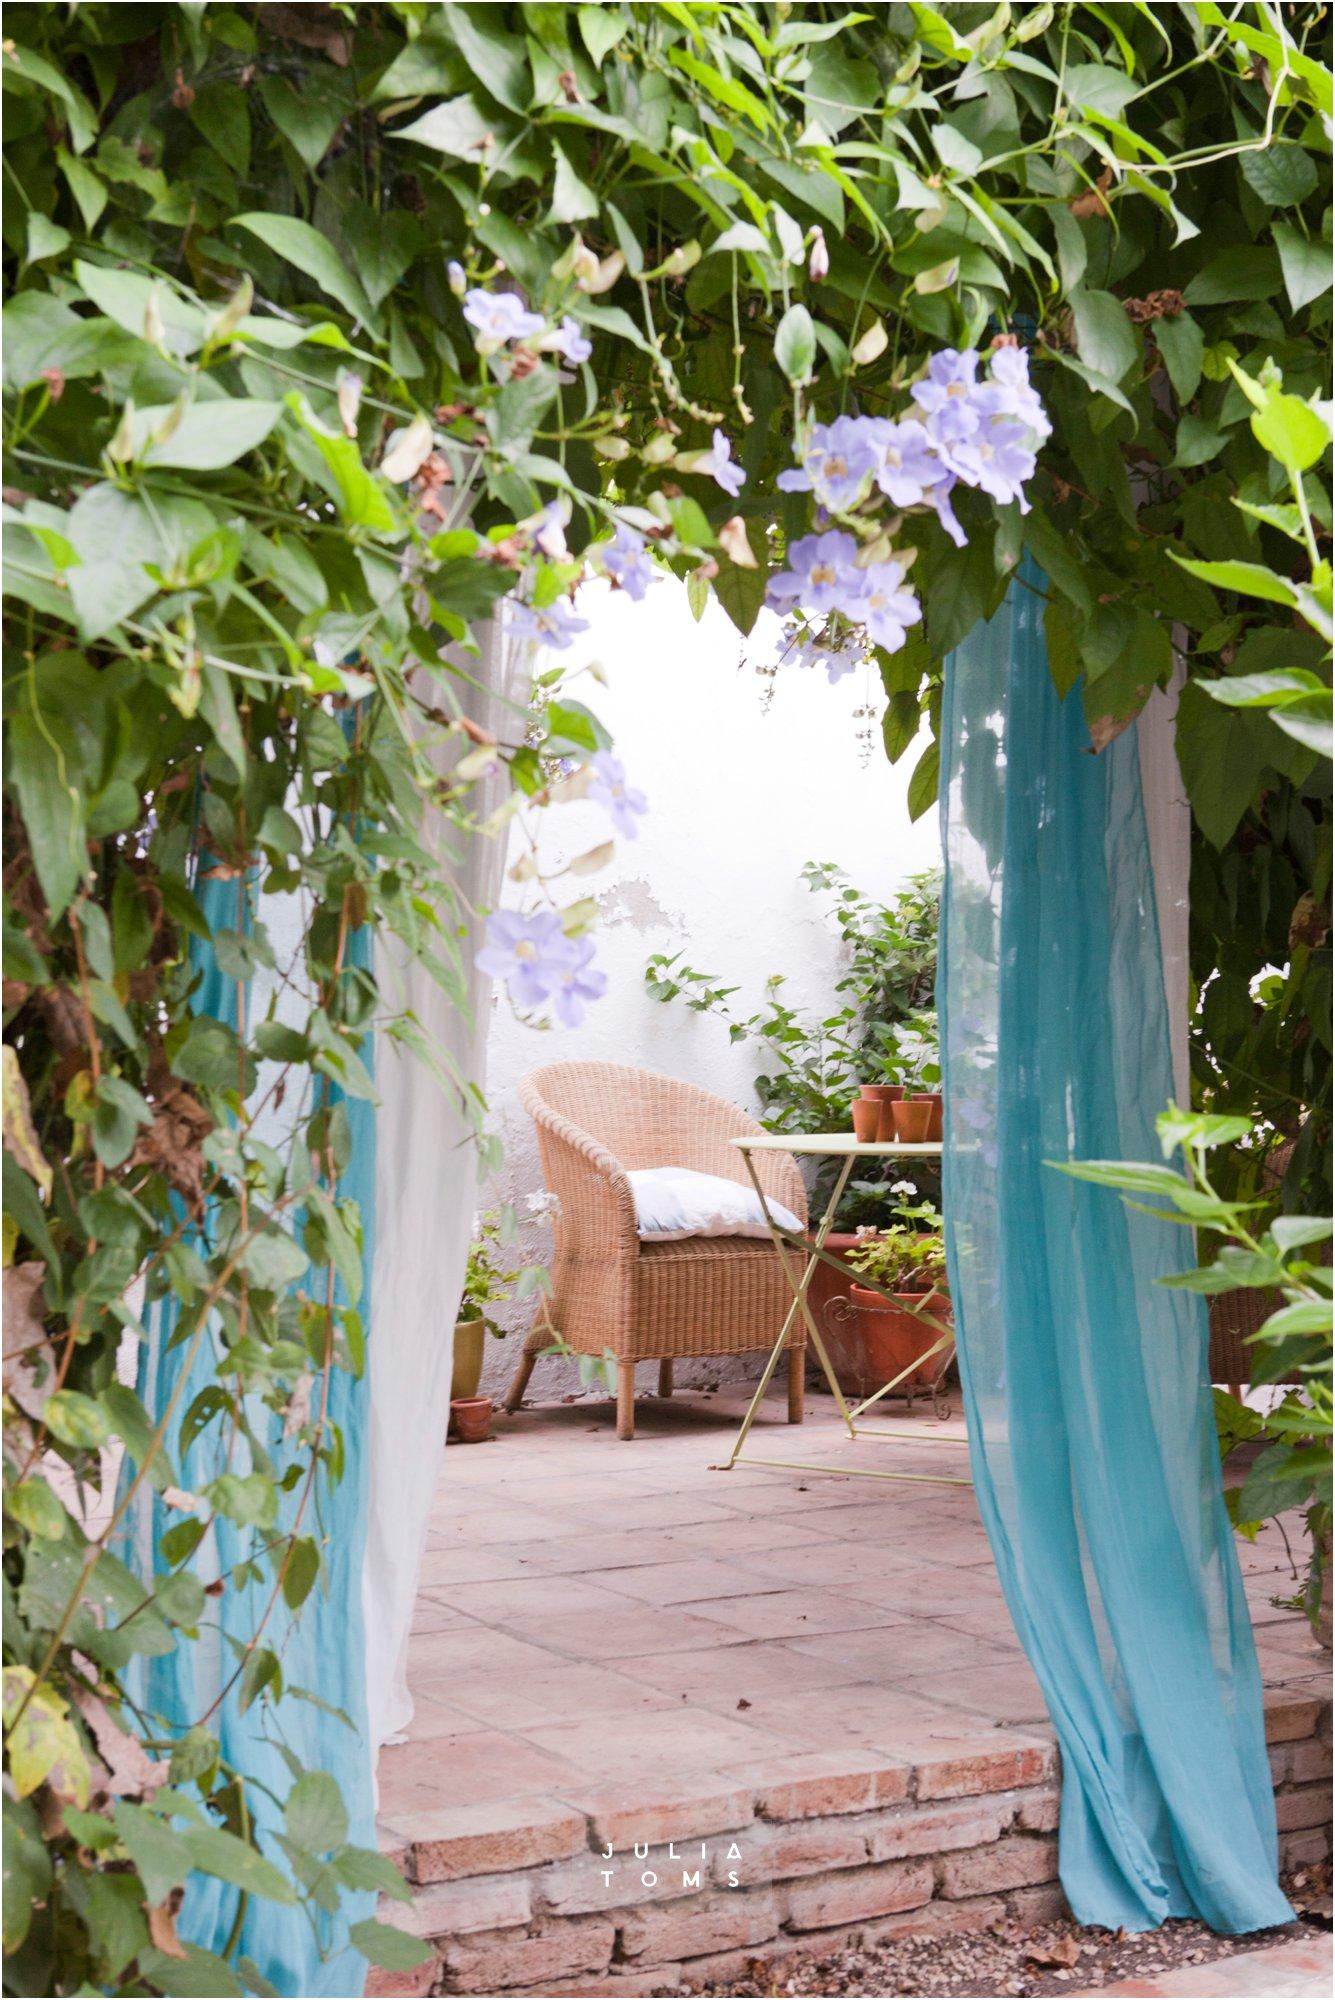 julia_toms_photography_interiors_magazine_023.jpg